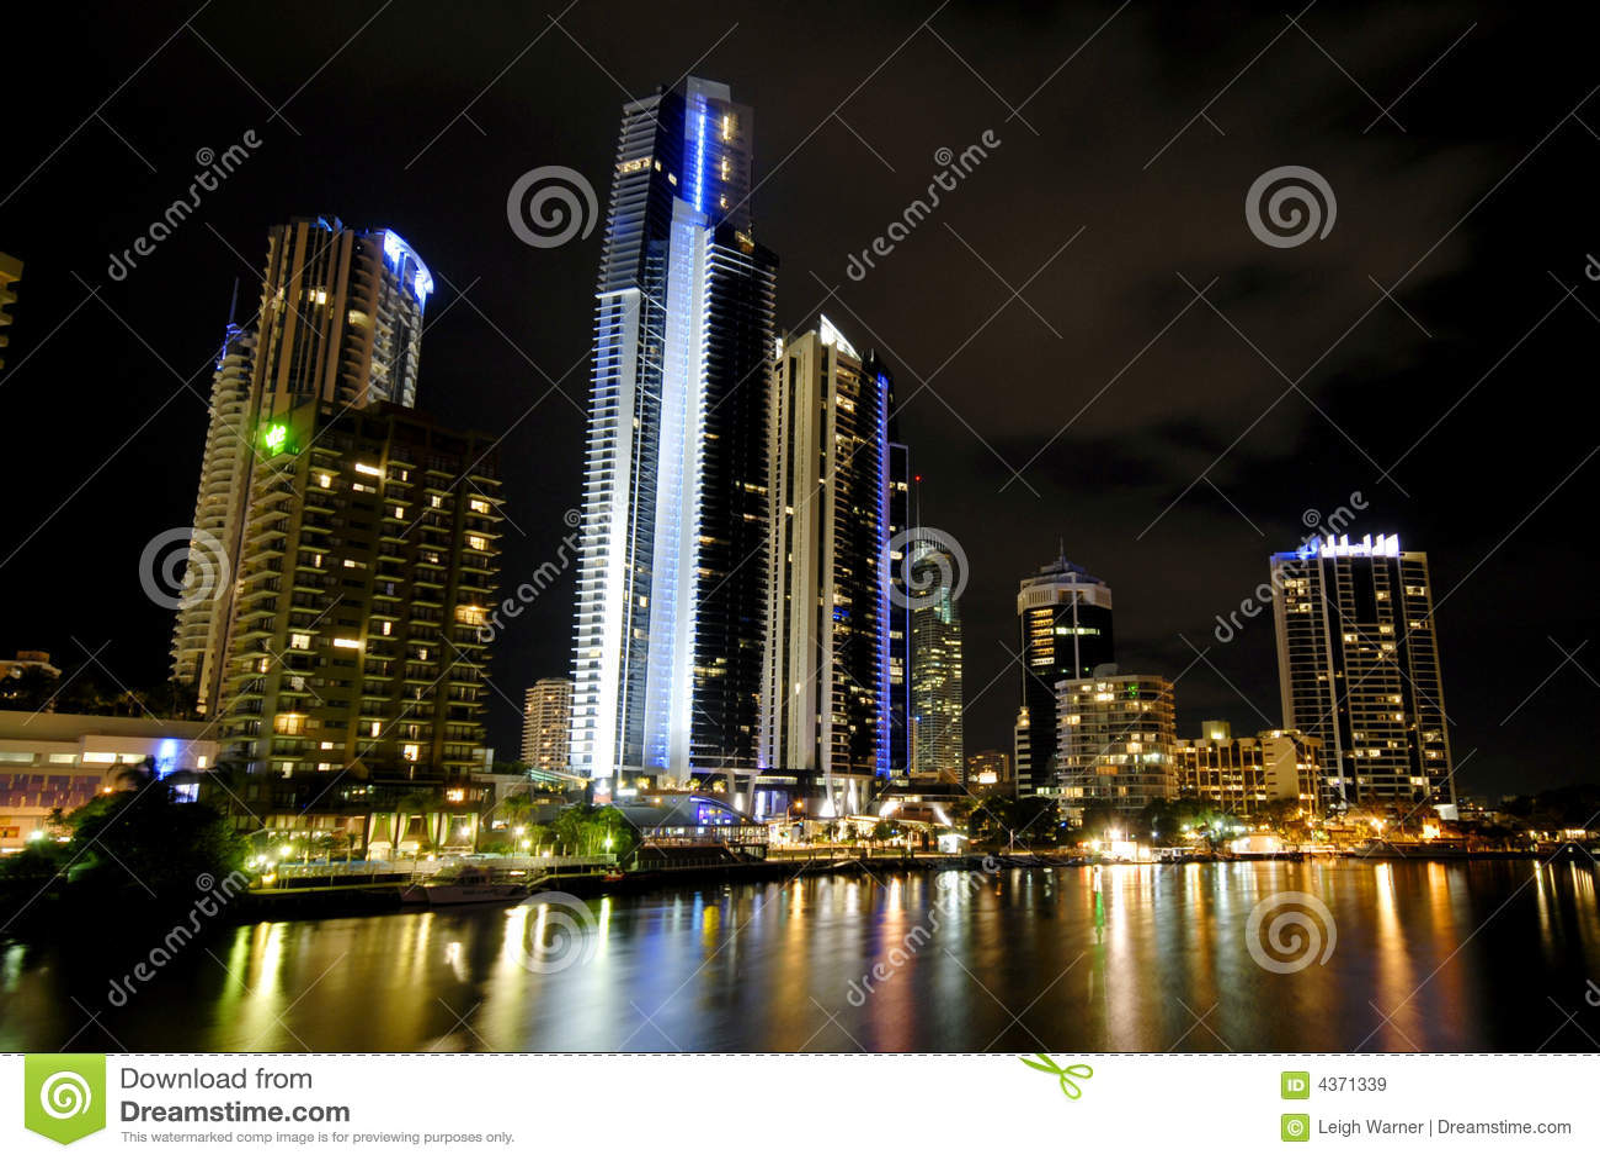 Gold Coast Night Life